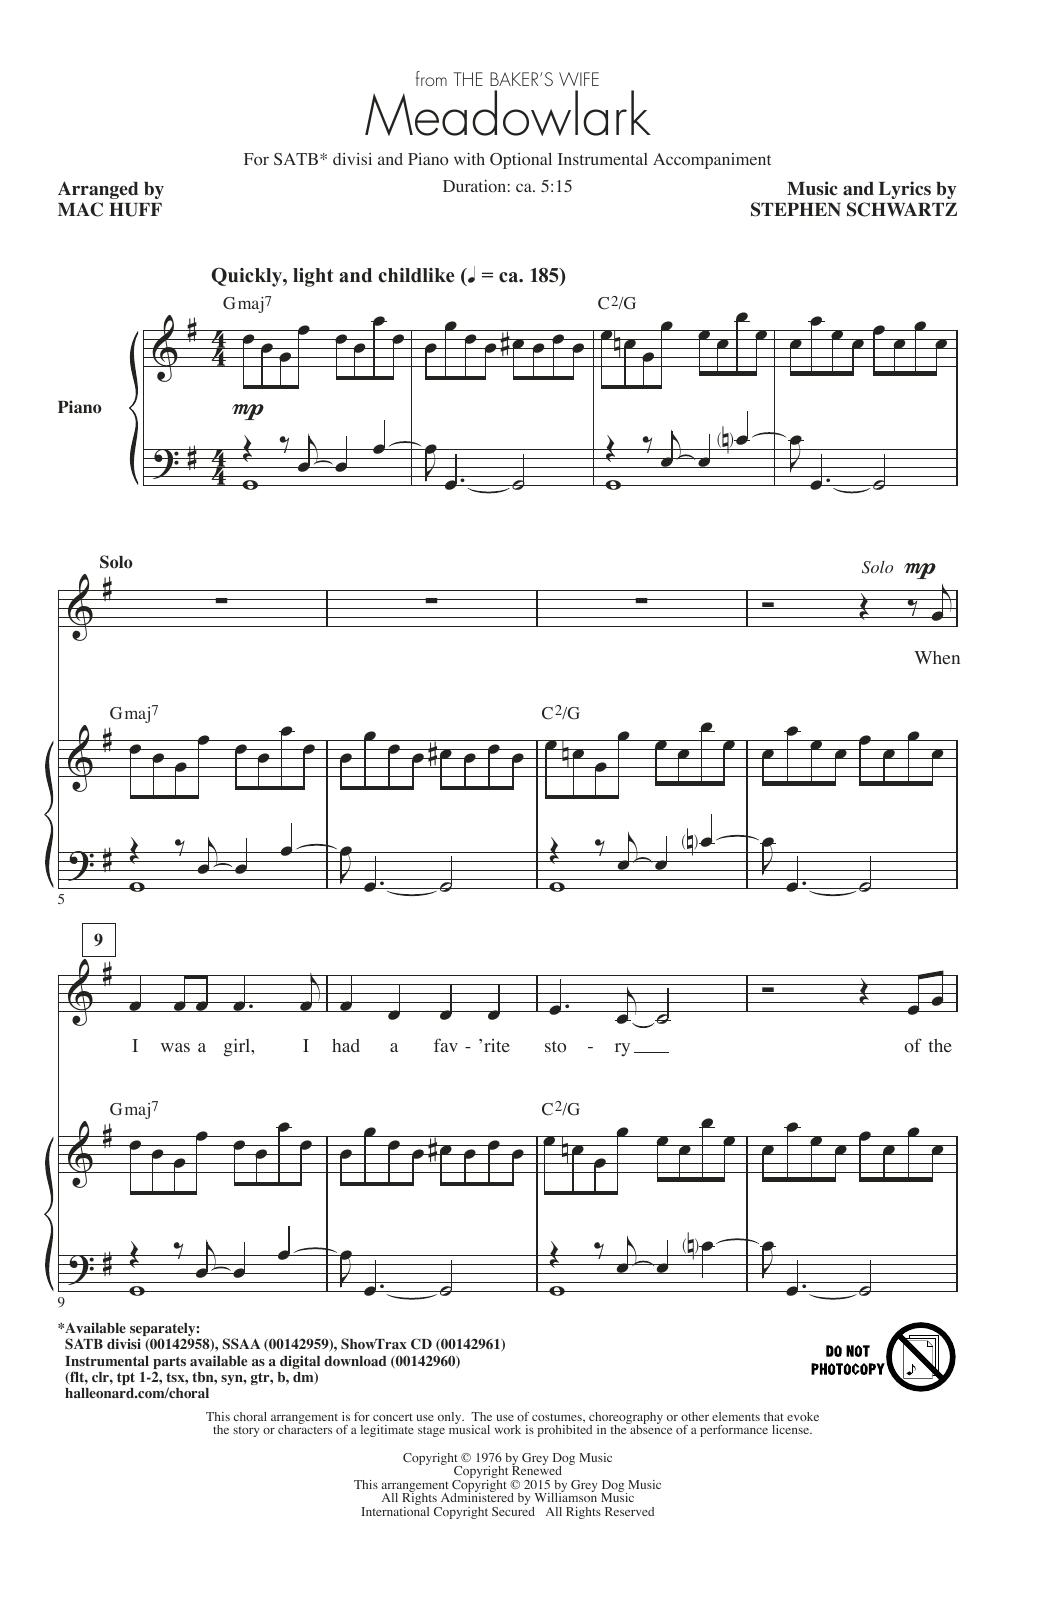 Partition chorale Meadowlark (Arr. Mac Huff) de Stephen Schwartz - SATB